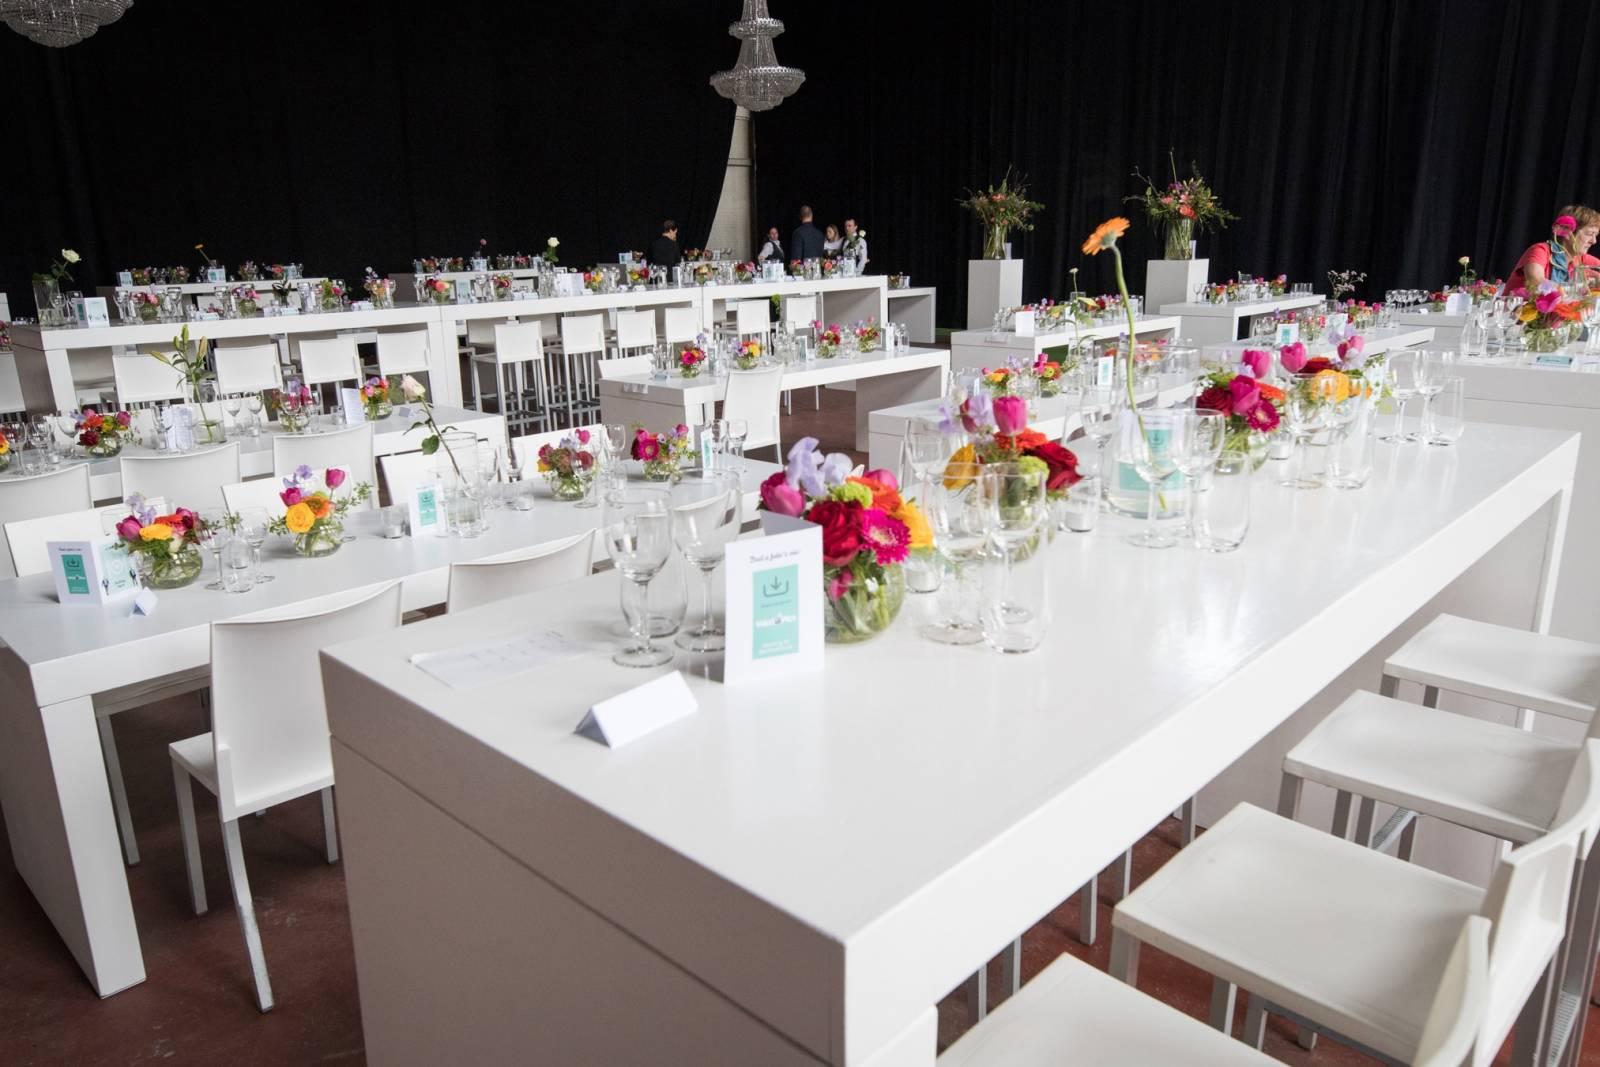 Hangar 43 - Feestzaal Oost-Vlaanderen - Industrieel - House of Weddings - 6